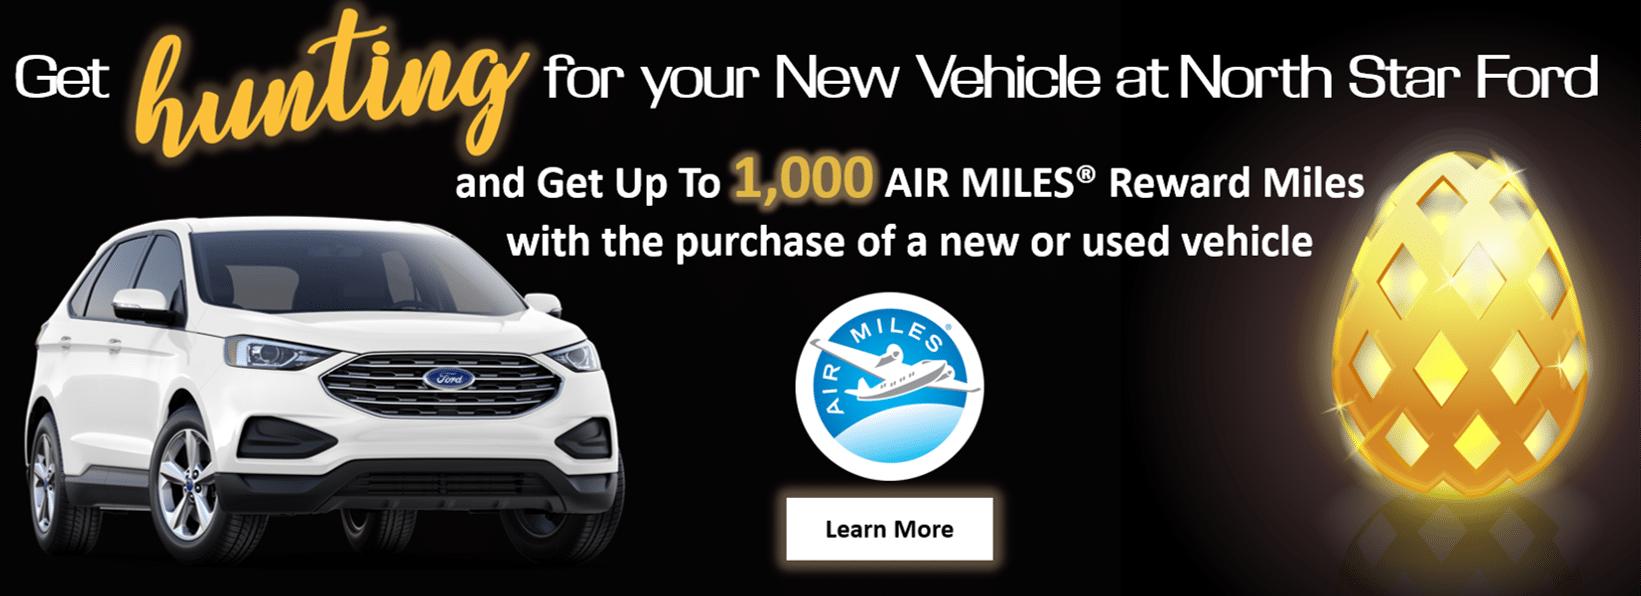 1,000 Airmiles